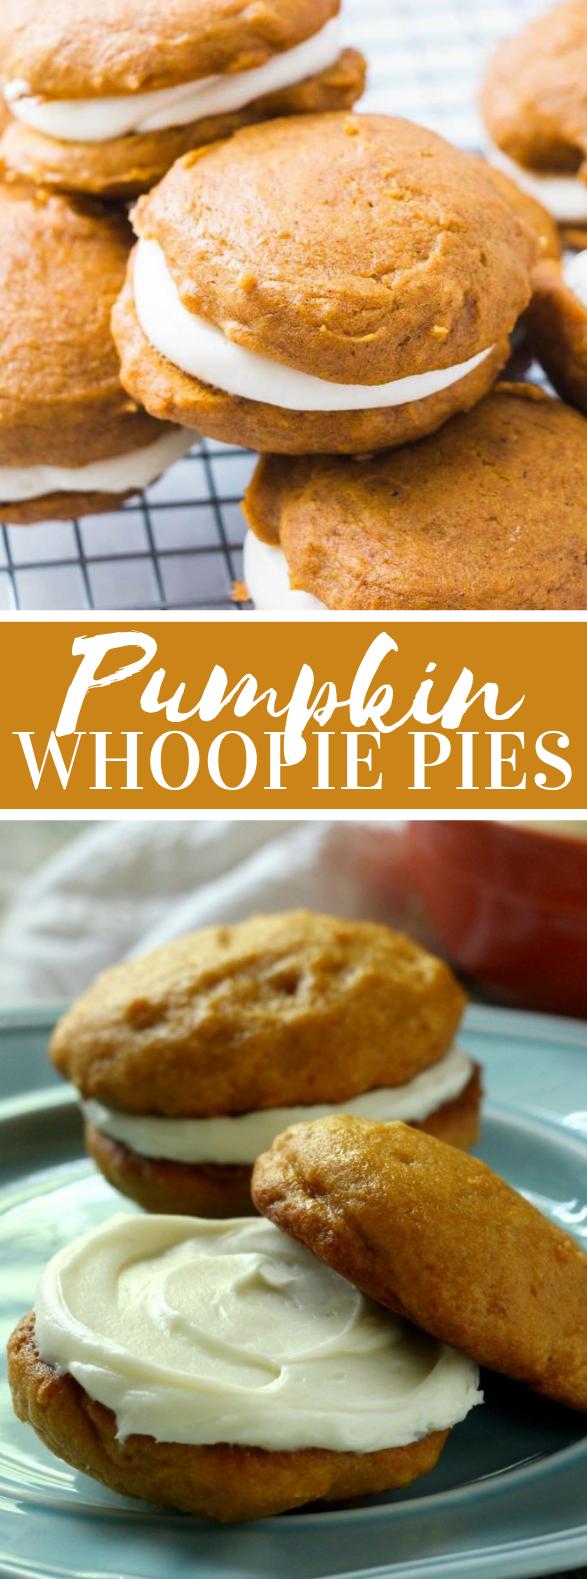 Cream Cheese Filled Pumpkin Whoopie Pies #cookies #desserts